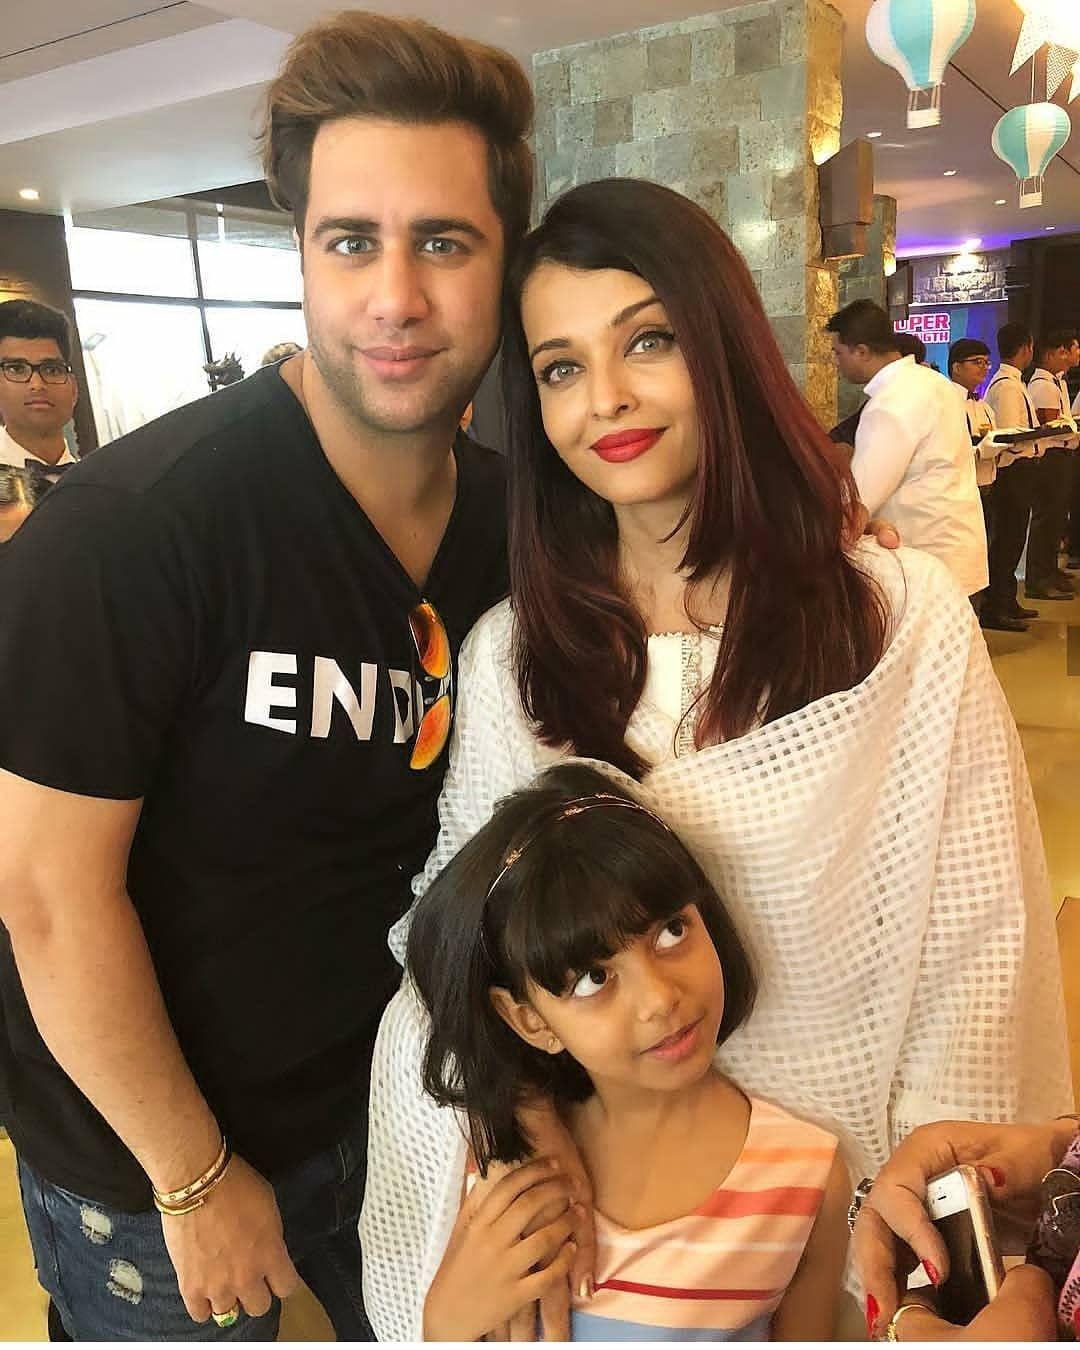 Aishwarya Rai Bachchan Aaradhya Bachchan Make For A Pretty Sight At Shilpa Shetty S Son Viaan S Birthday Aaradhya Bachchan Aishwarya Rai Bachchan Aishwarya Rai